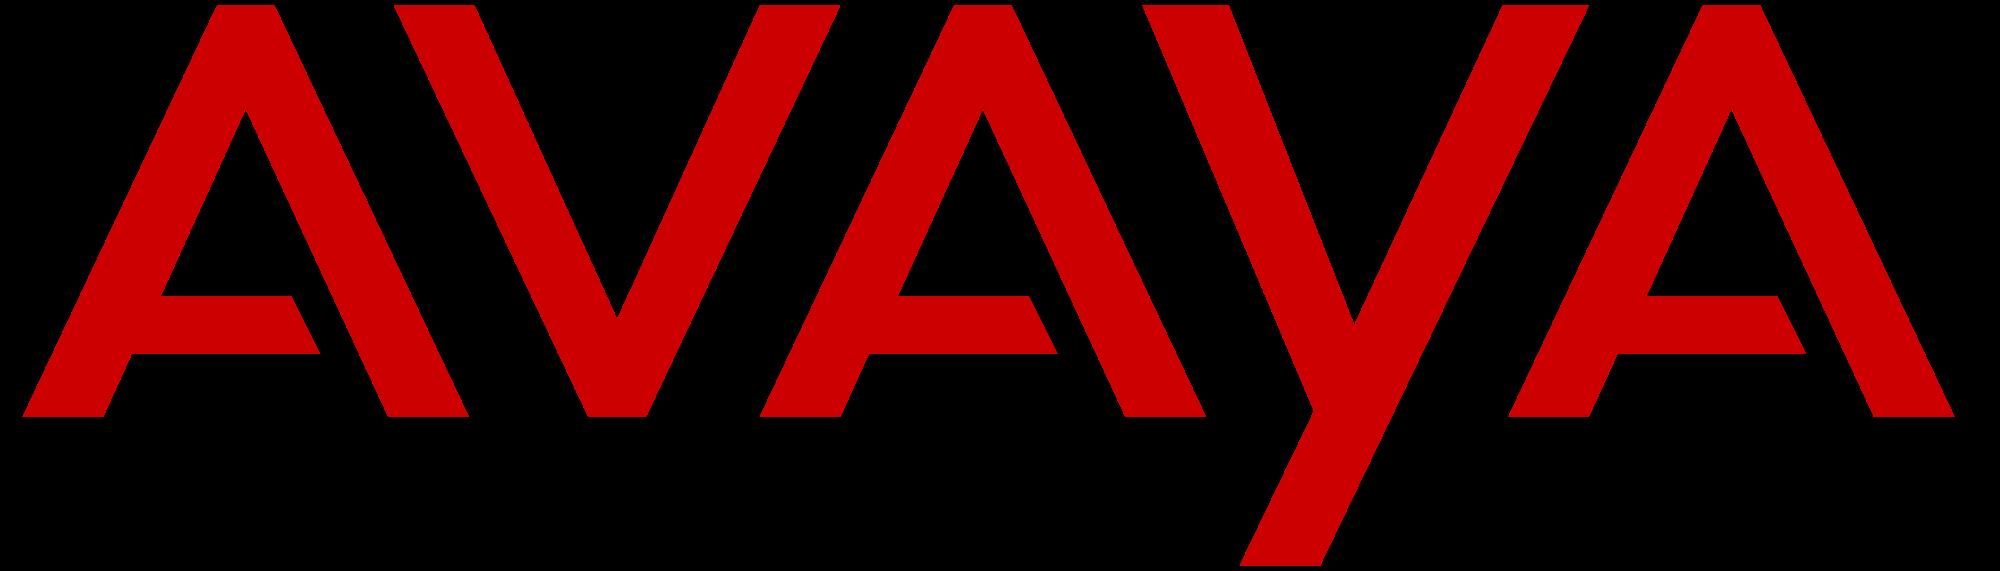 Avaya Cloud Office (By RingCentral) logo